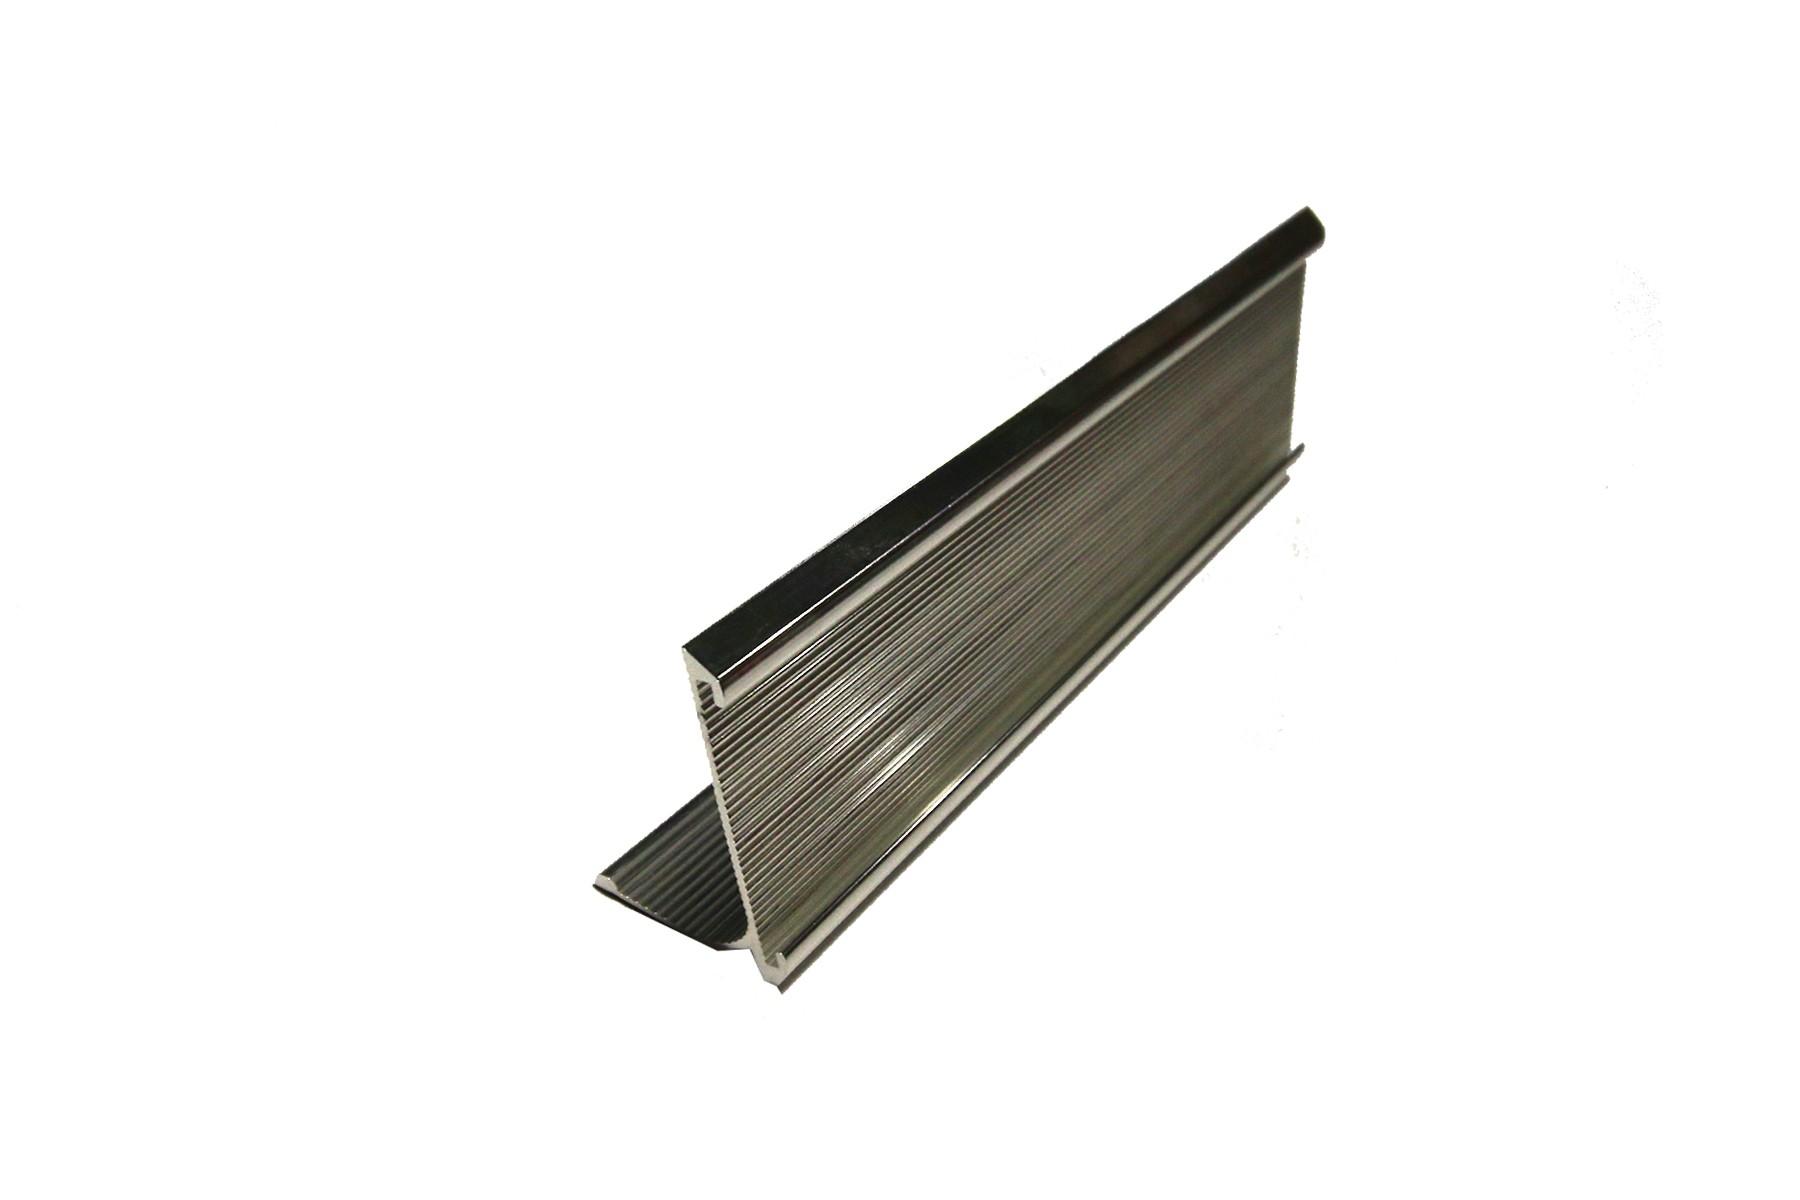 2 x 8 Ribbed Desk Holder, Silver